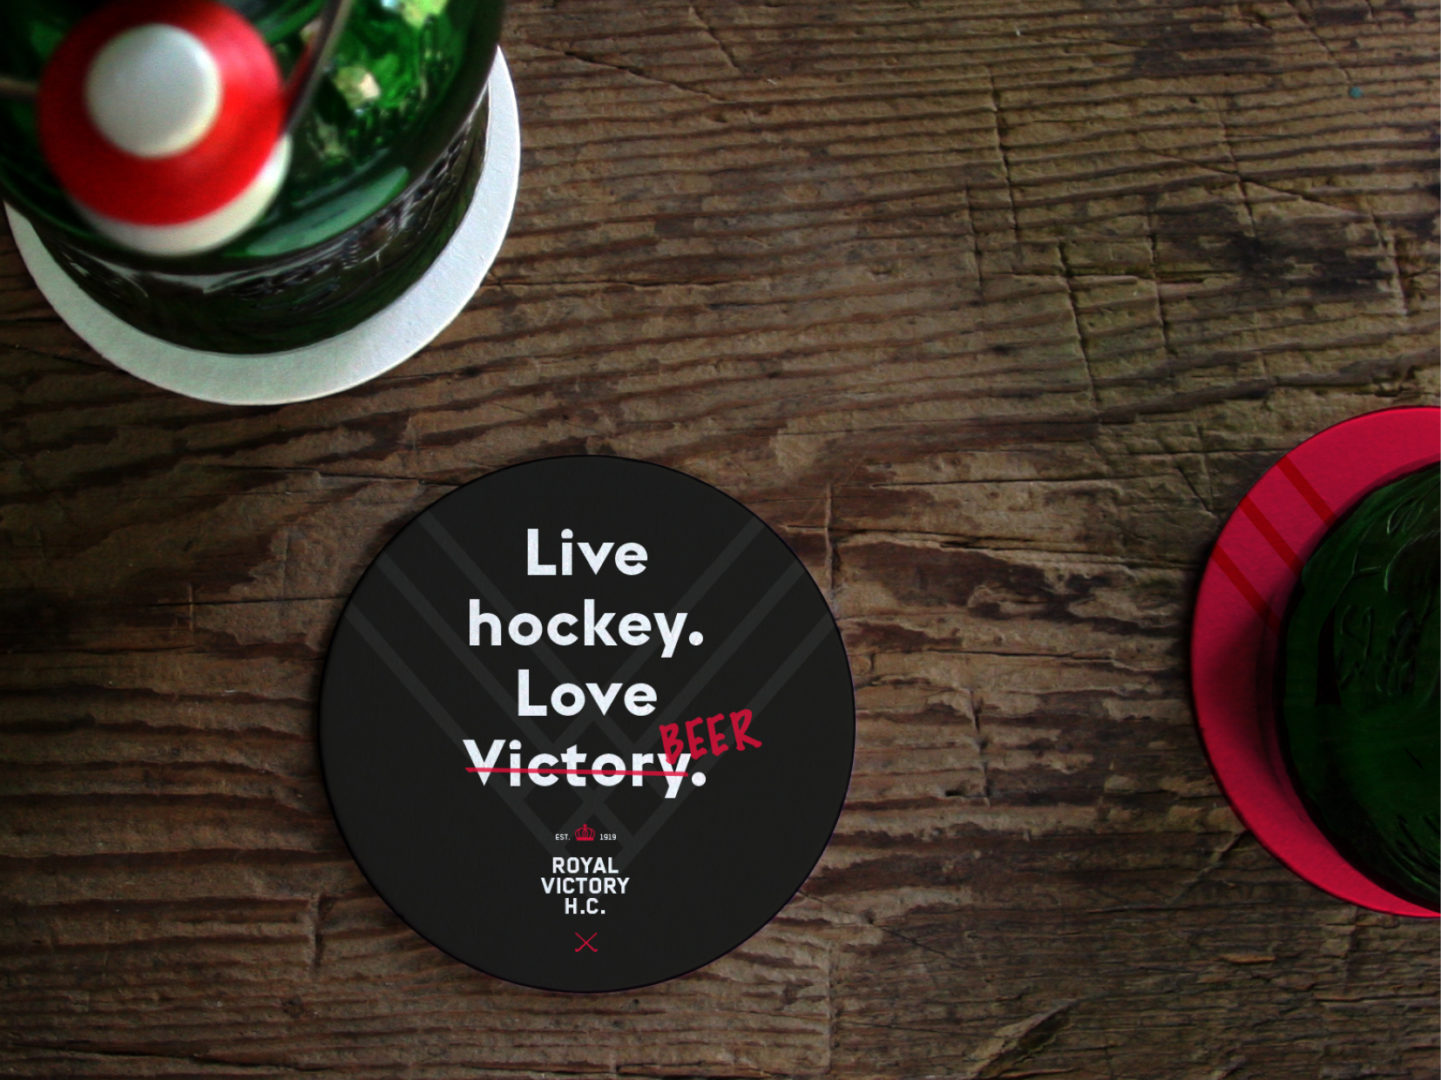 Victory tagline